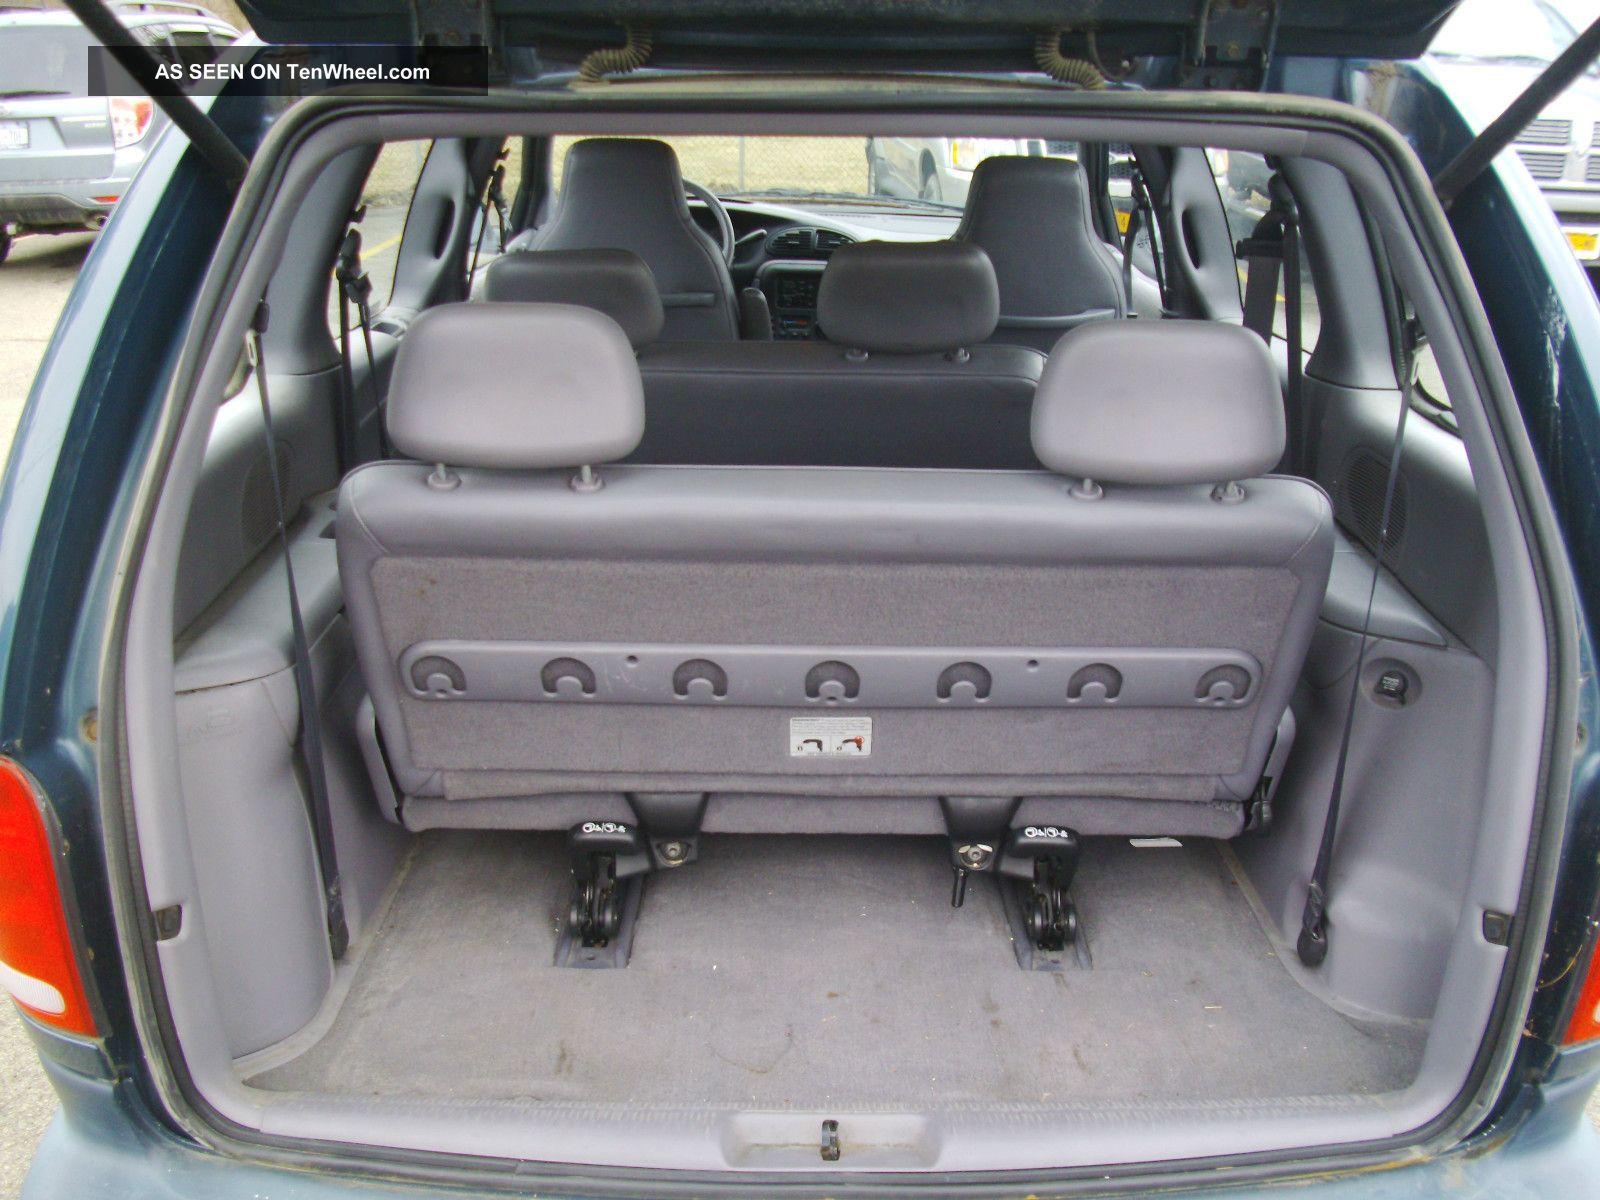 Dodge Caravan L Base Passenger Van Door Teal Lgw on Gm Bolt Diagram Electrical Wiring Diagrams Ford F Harness